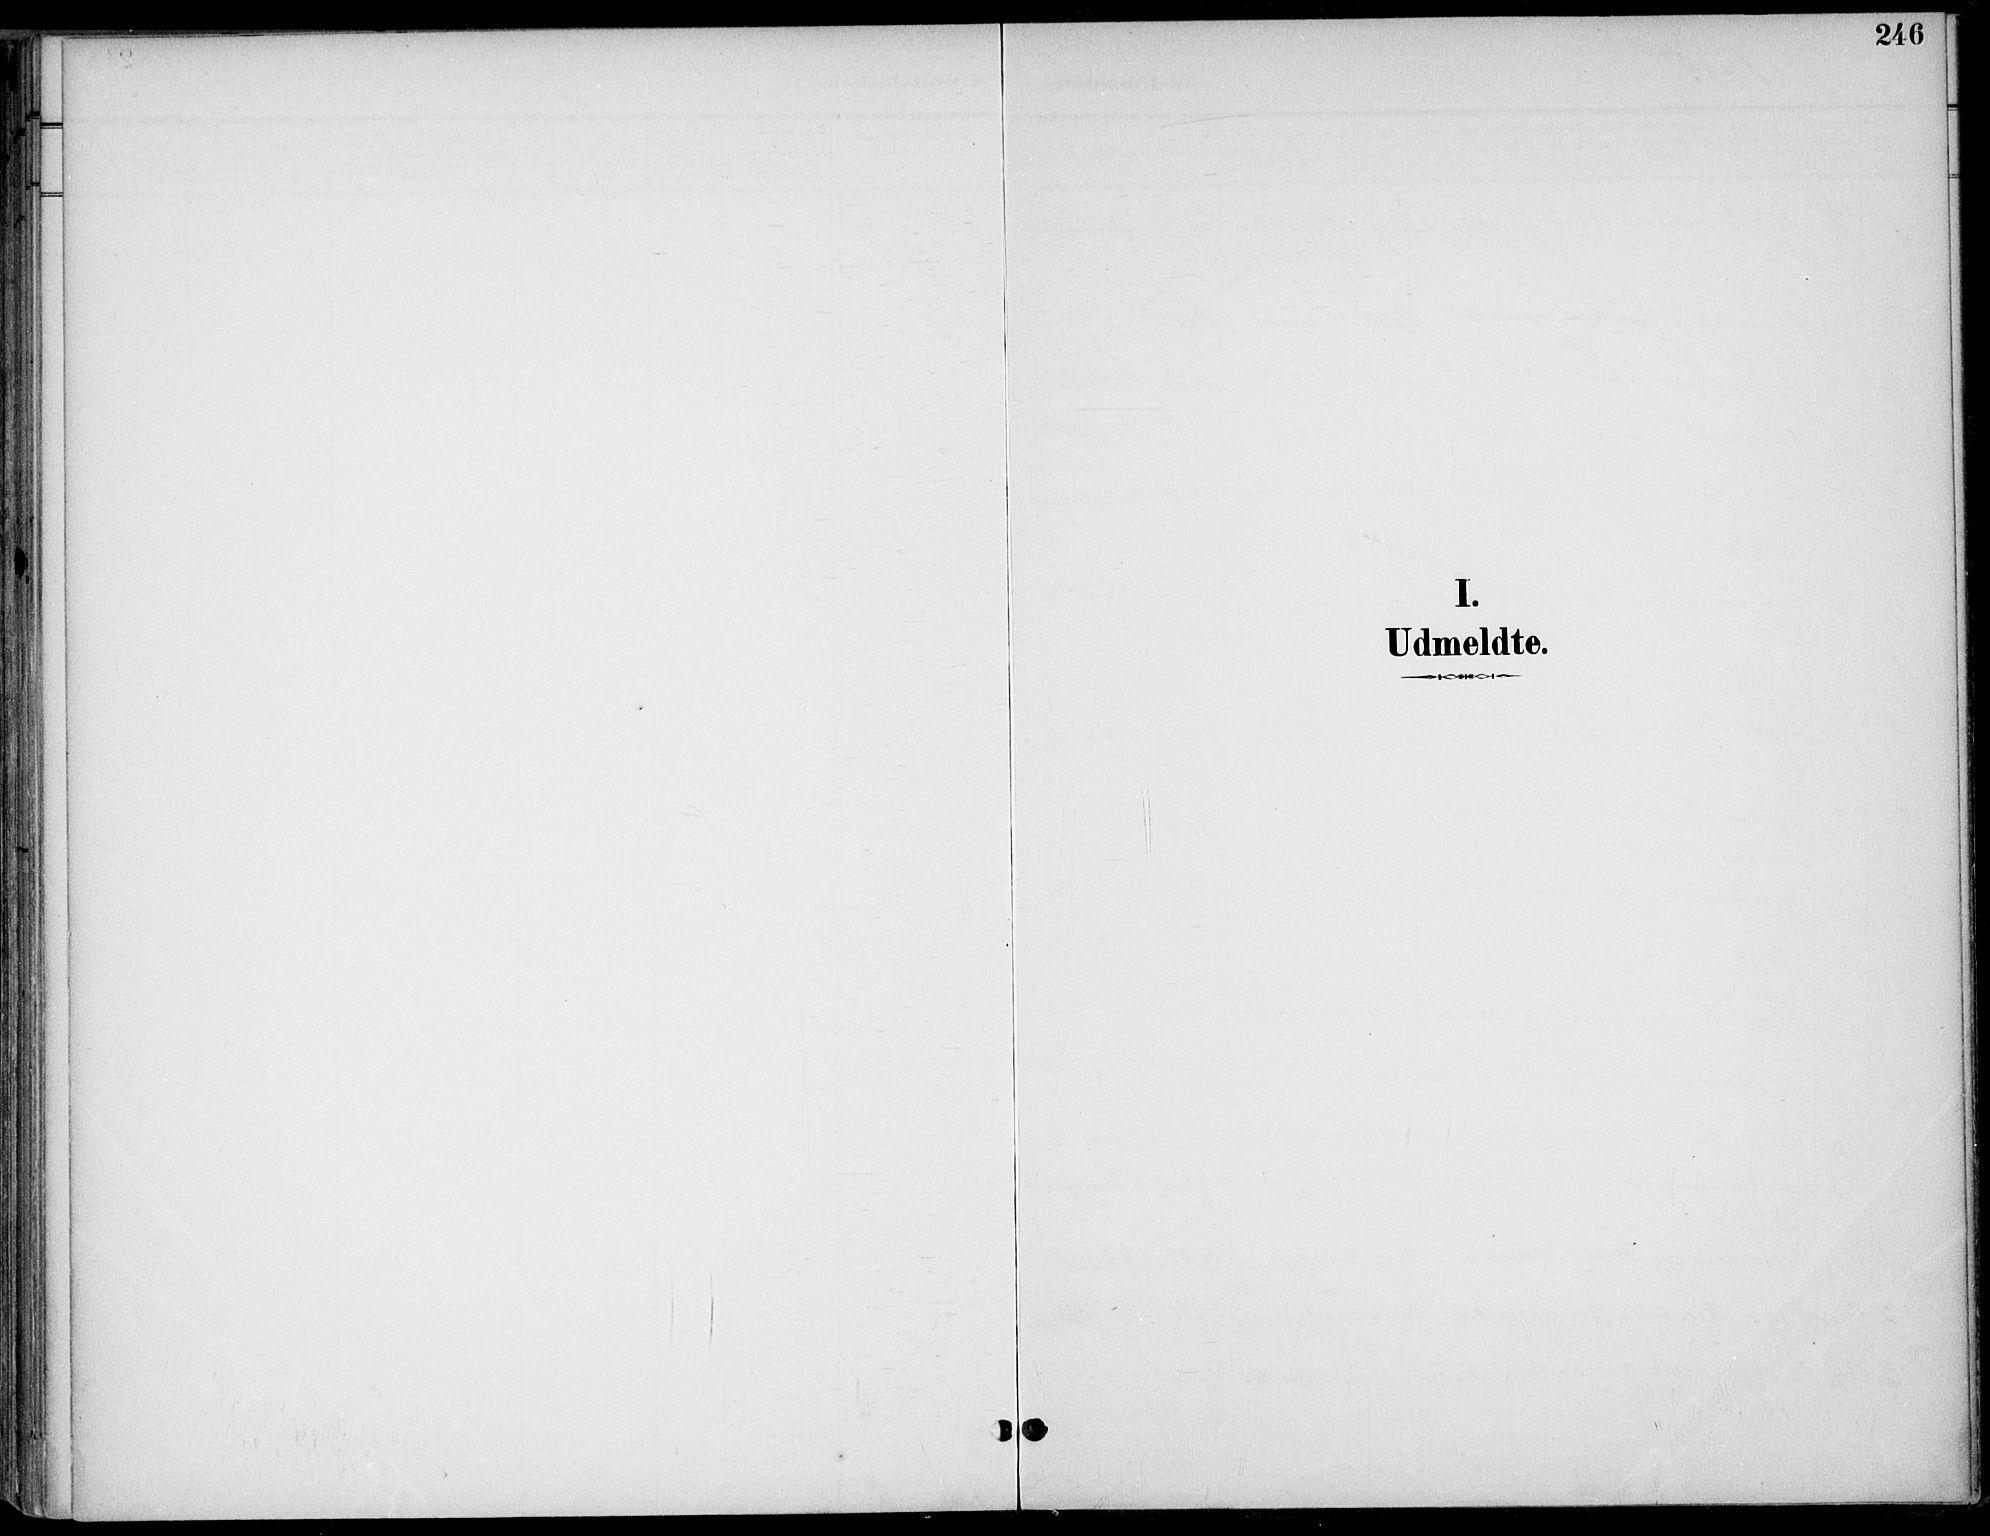 SAKO, Drangedal kirkebøker, F/Fa/L0012: Ministerialbok nr. 12, 1895-1905, s. 246